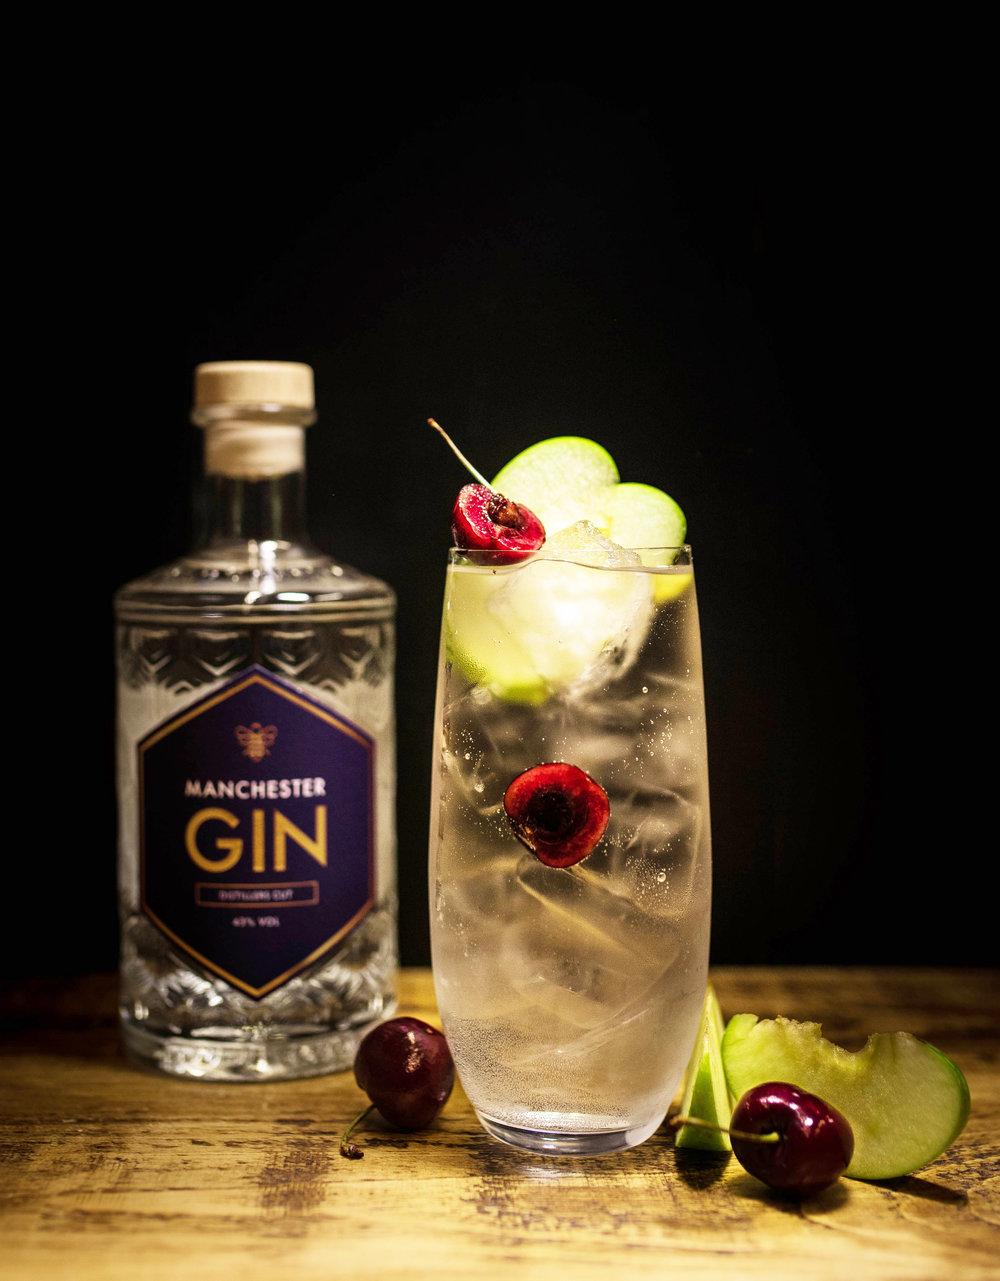 Mancheter Gin Distillers Cut Perfect Serve